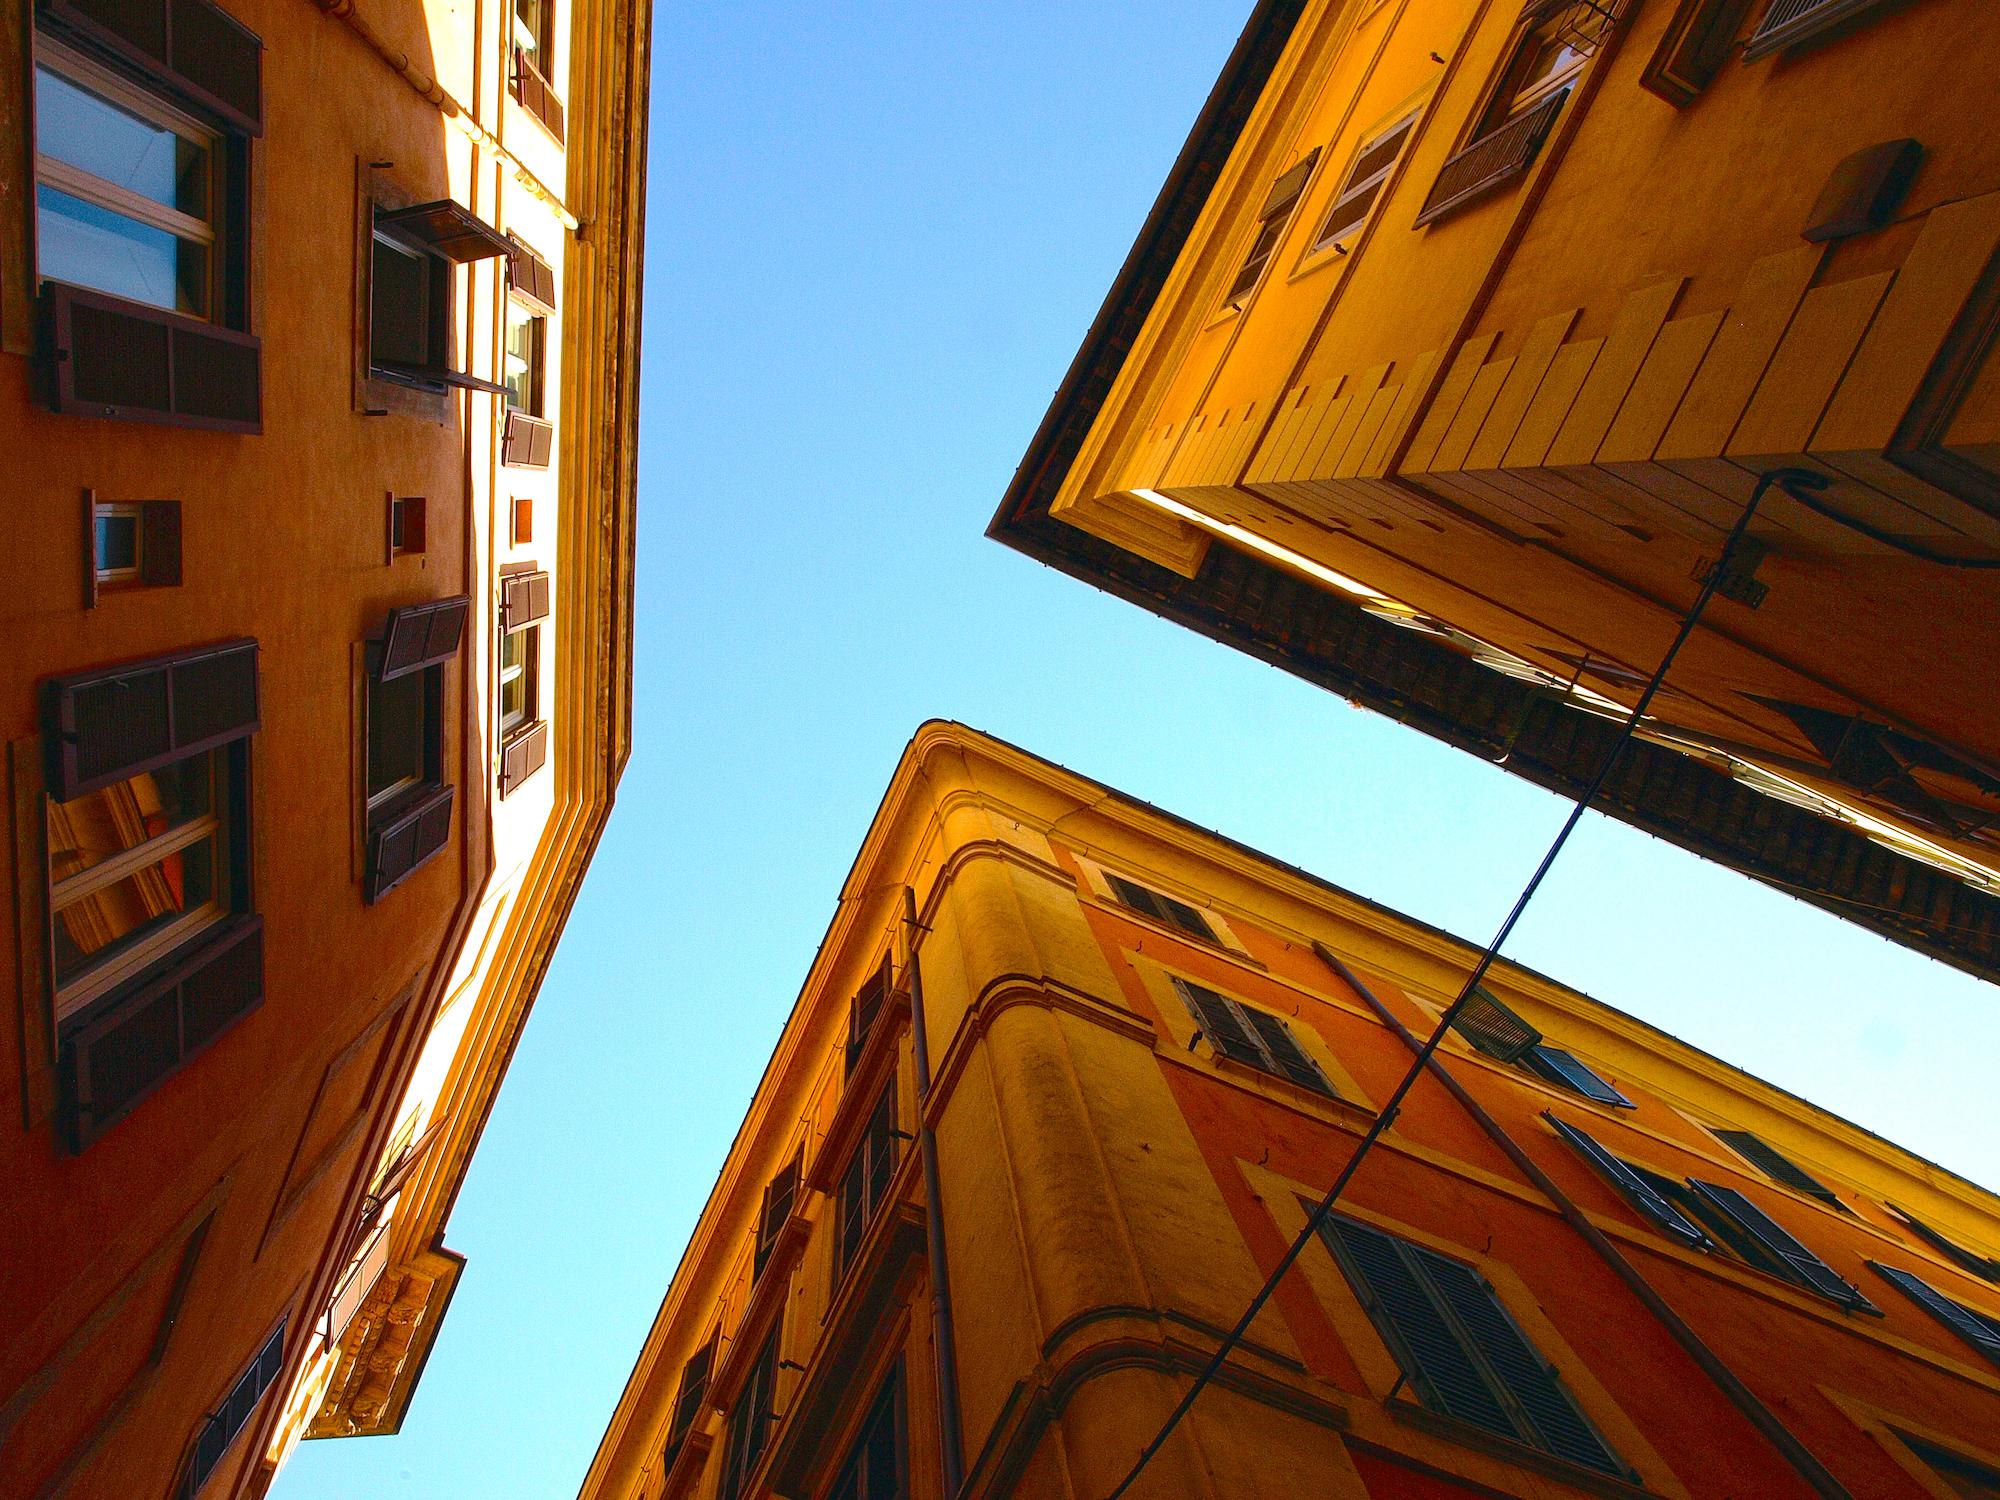 Angles  / Part of 'Trip To Italy' series by Geena Matuson @geenamatuson, 2011.